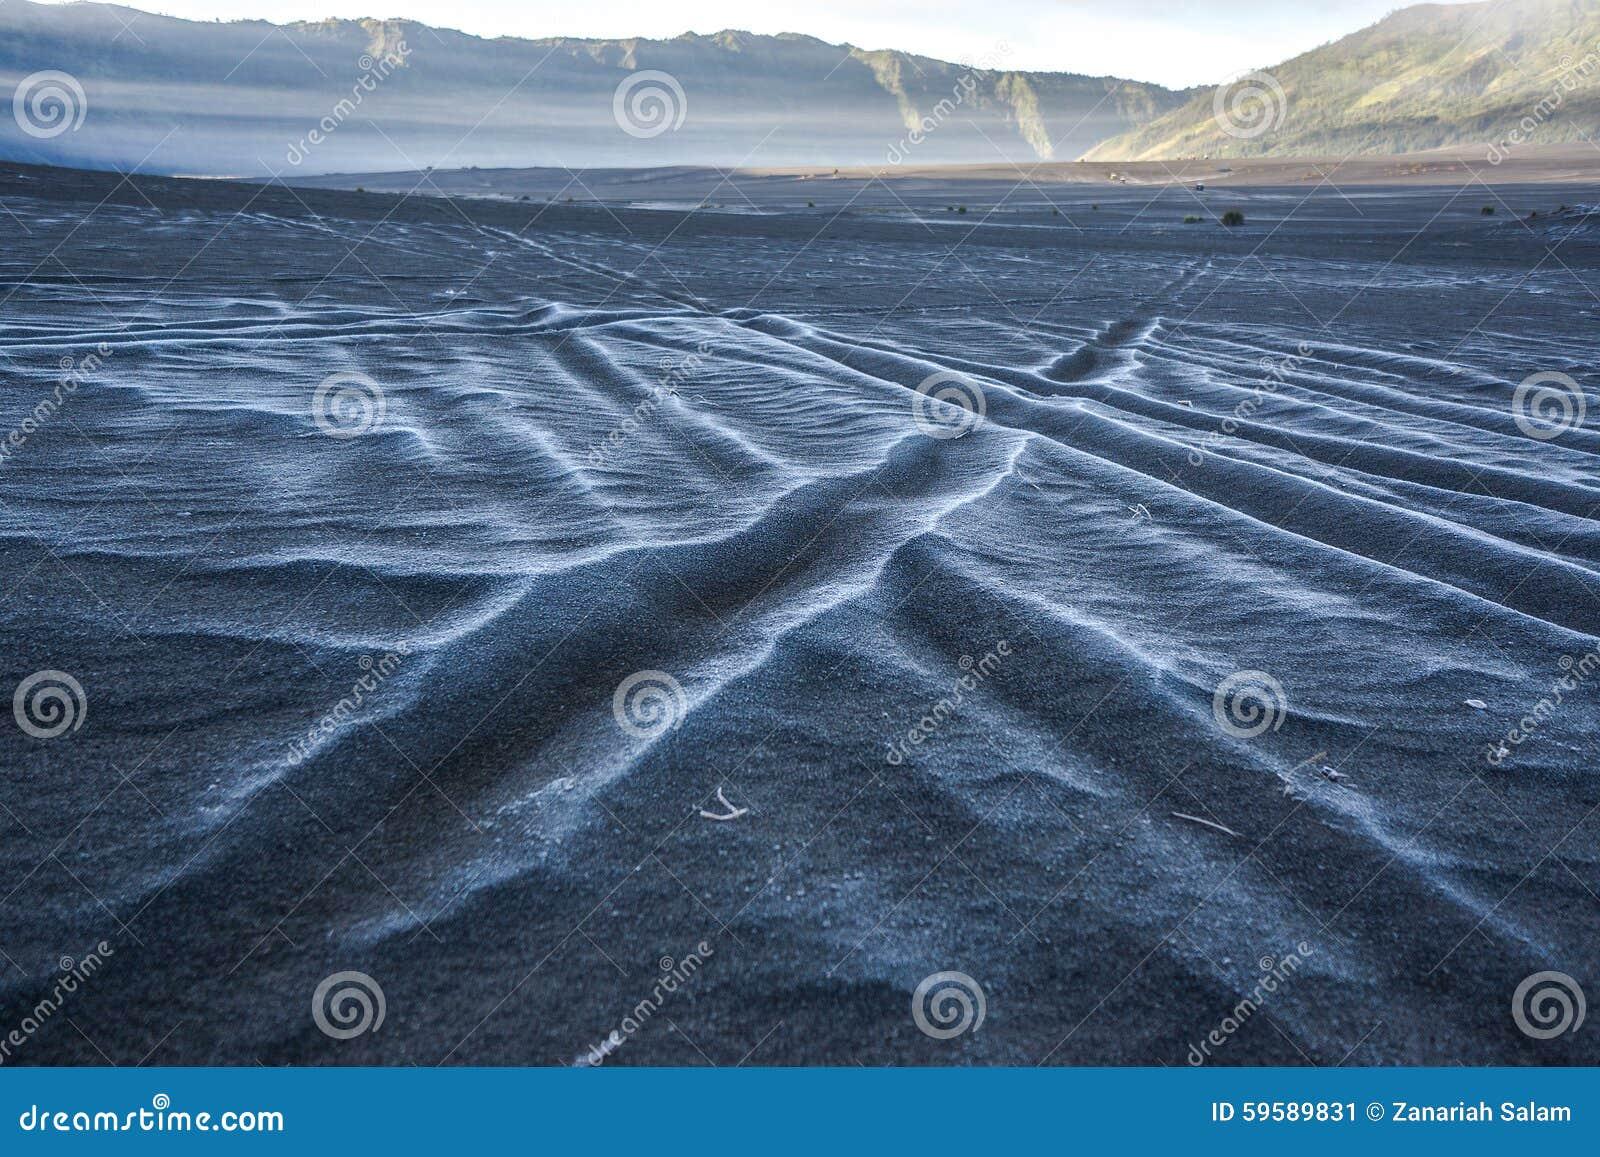 Snow at Sea of Sand